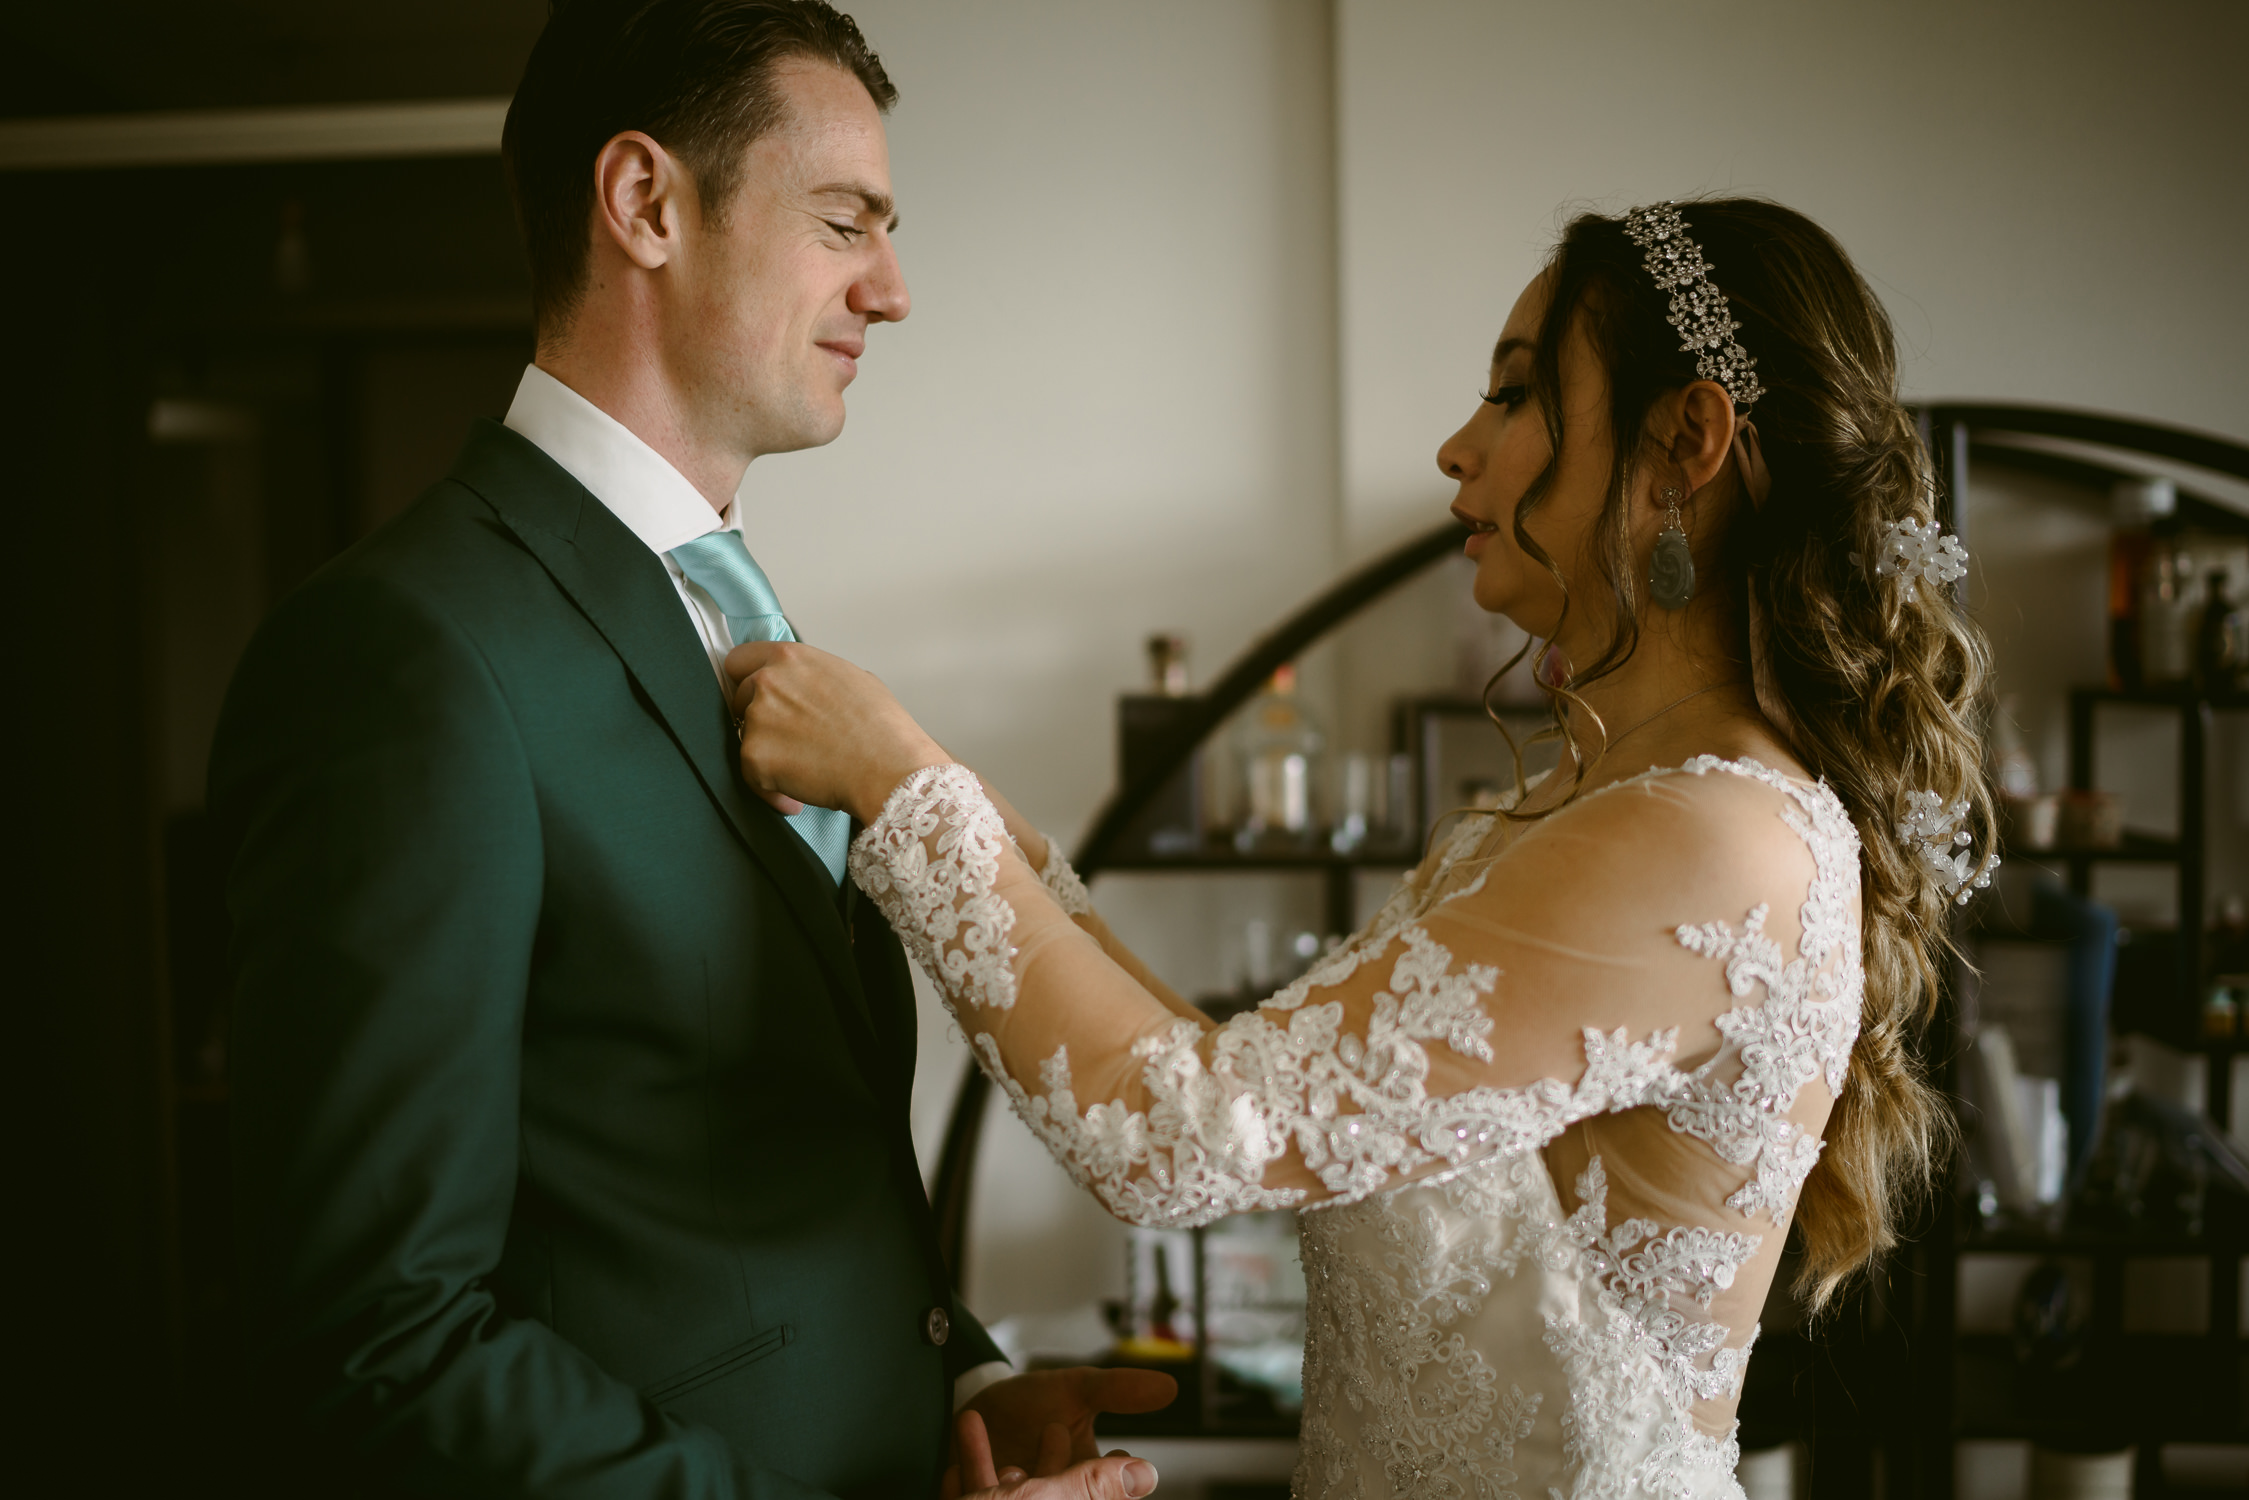 bruidsfotografie-amsterdam-utrecht-trouwfotograaf-mark-hadden-wedding-photography-Robin & Guus-011.jpg